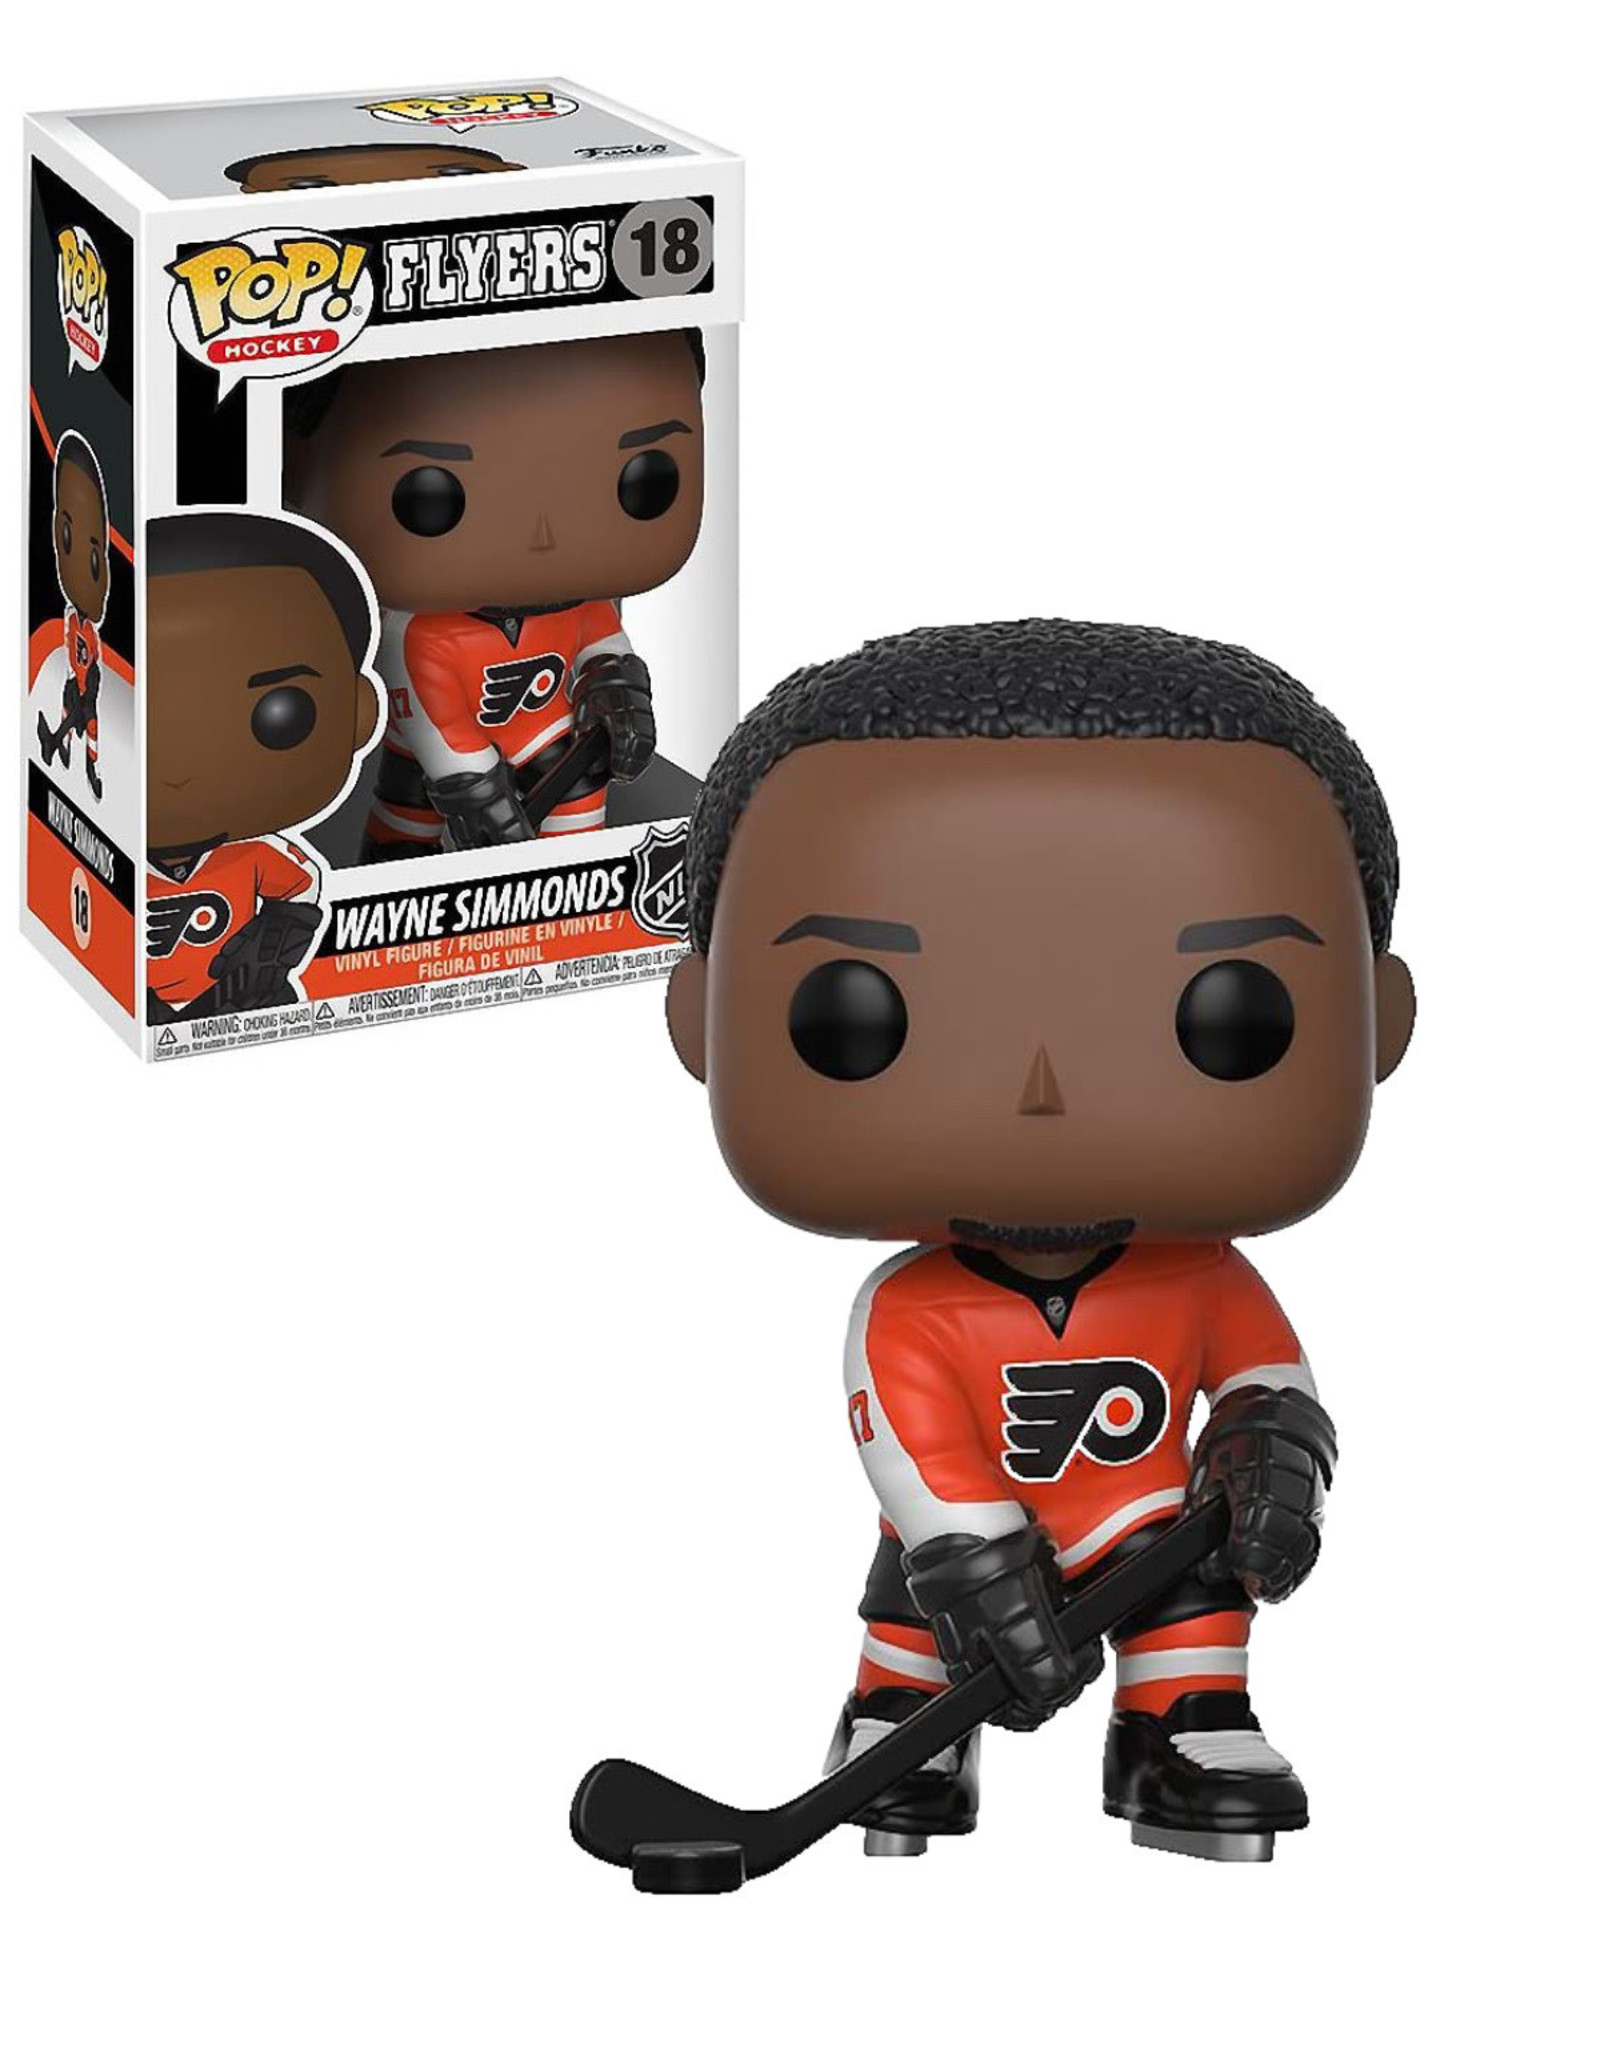 NHL Flyers 18 ( Funko Pop ) Wayne Simmonds